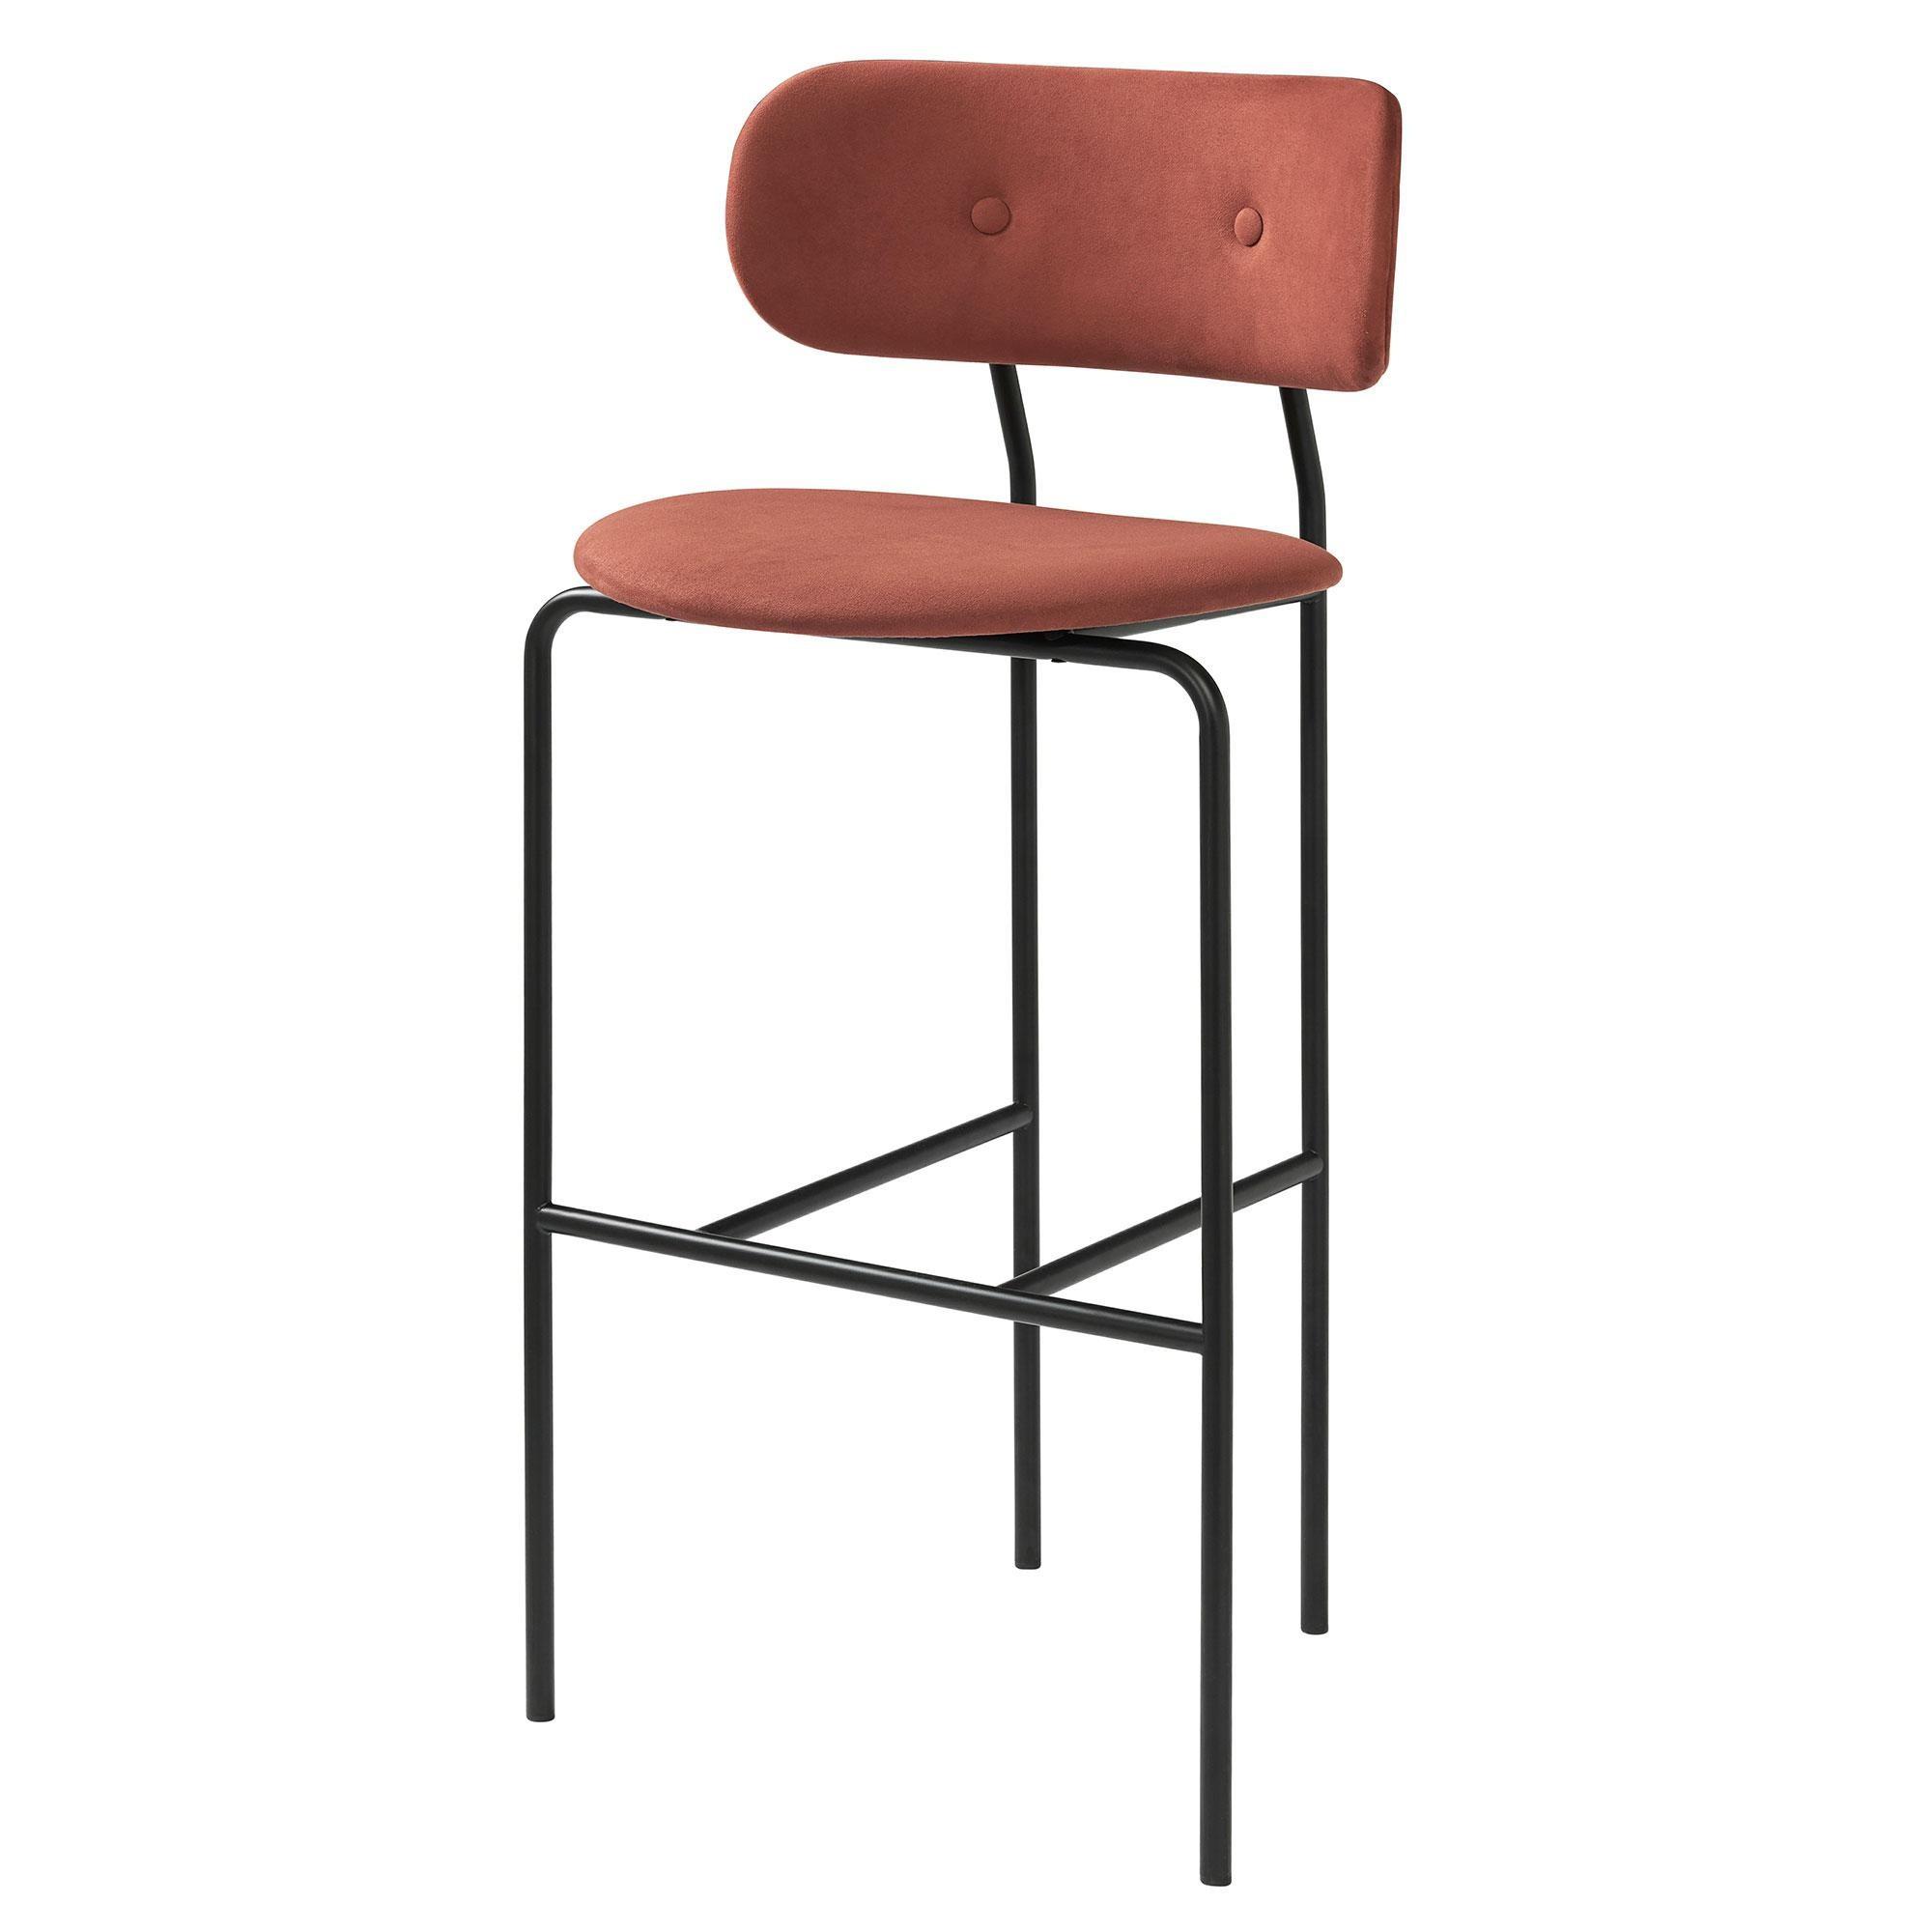 Coco Tabouret Coco Chair Bar Chair Tabouret De Bar mnO80wvN